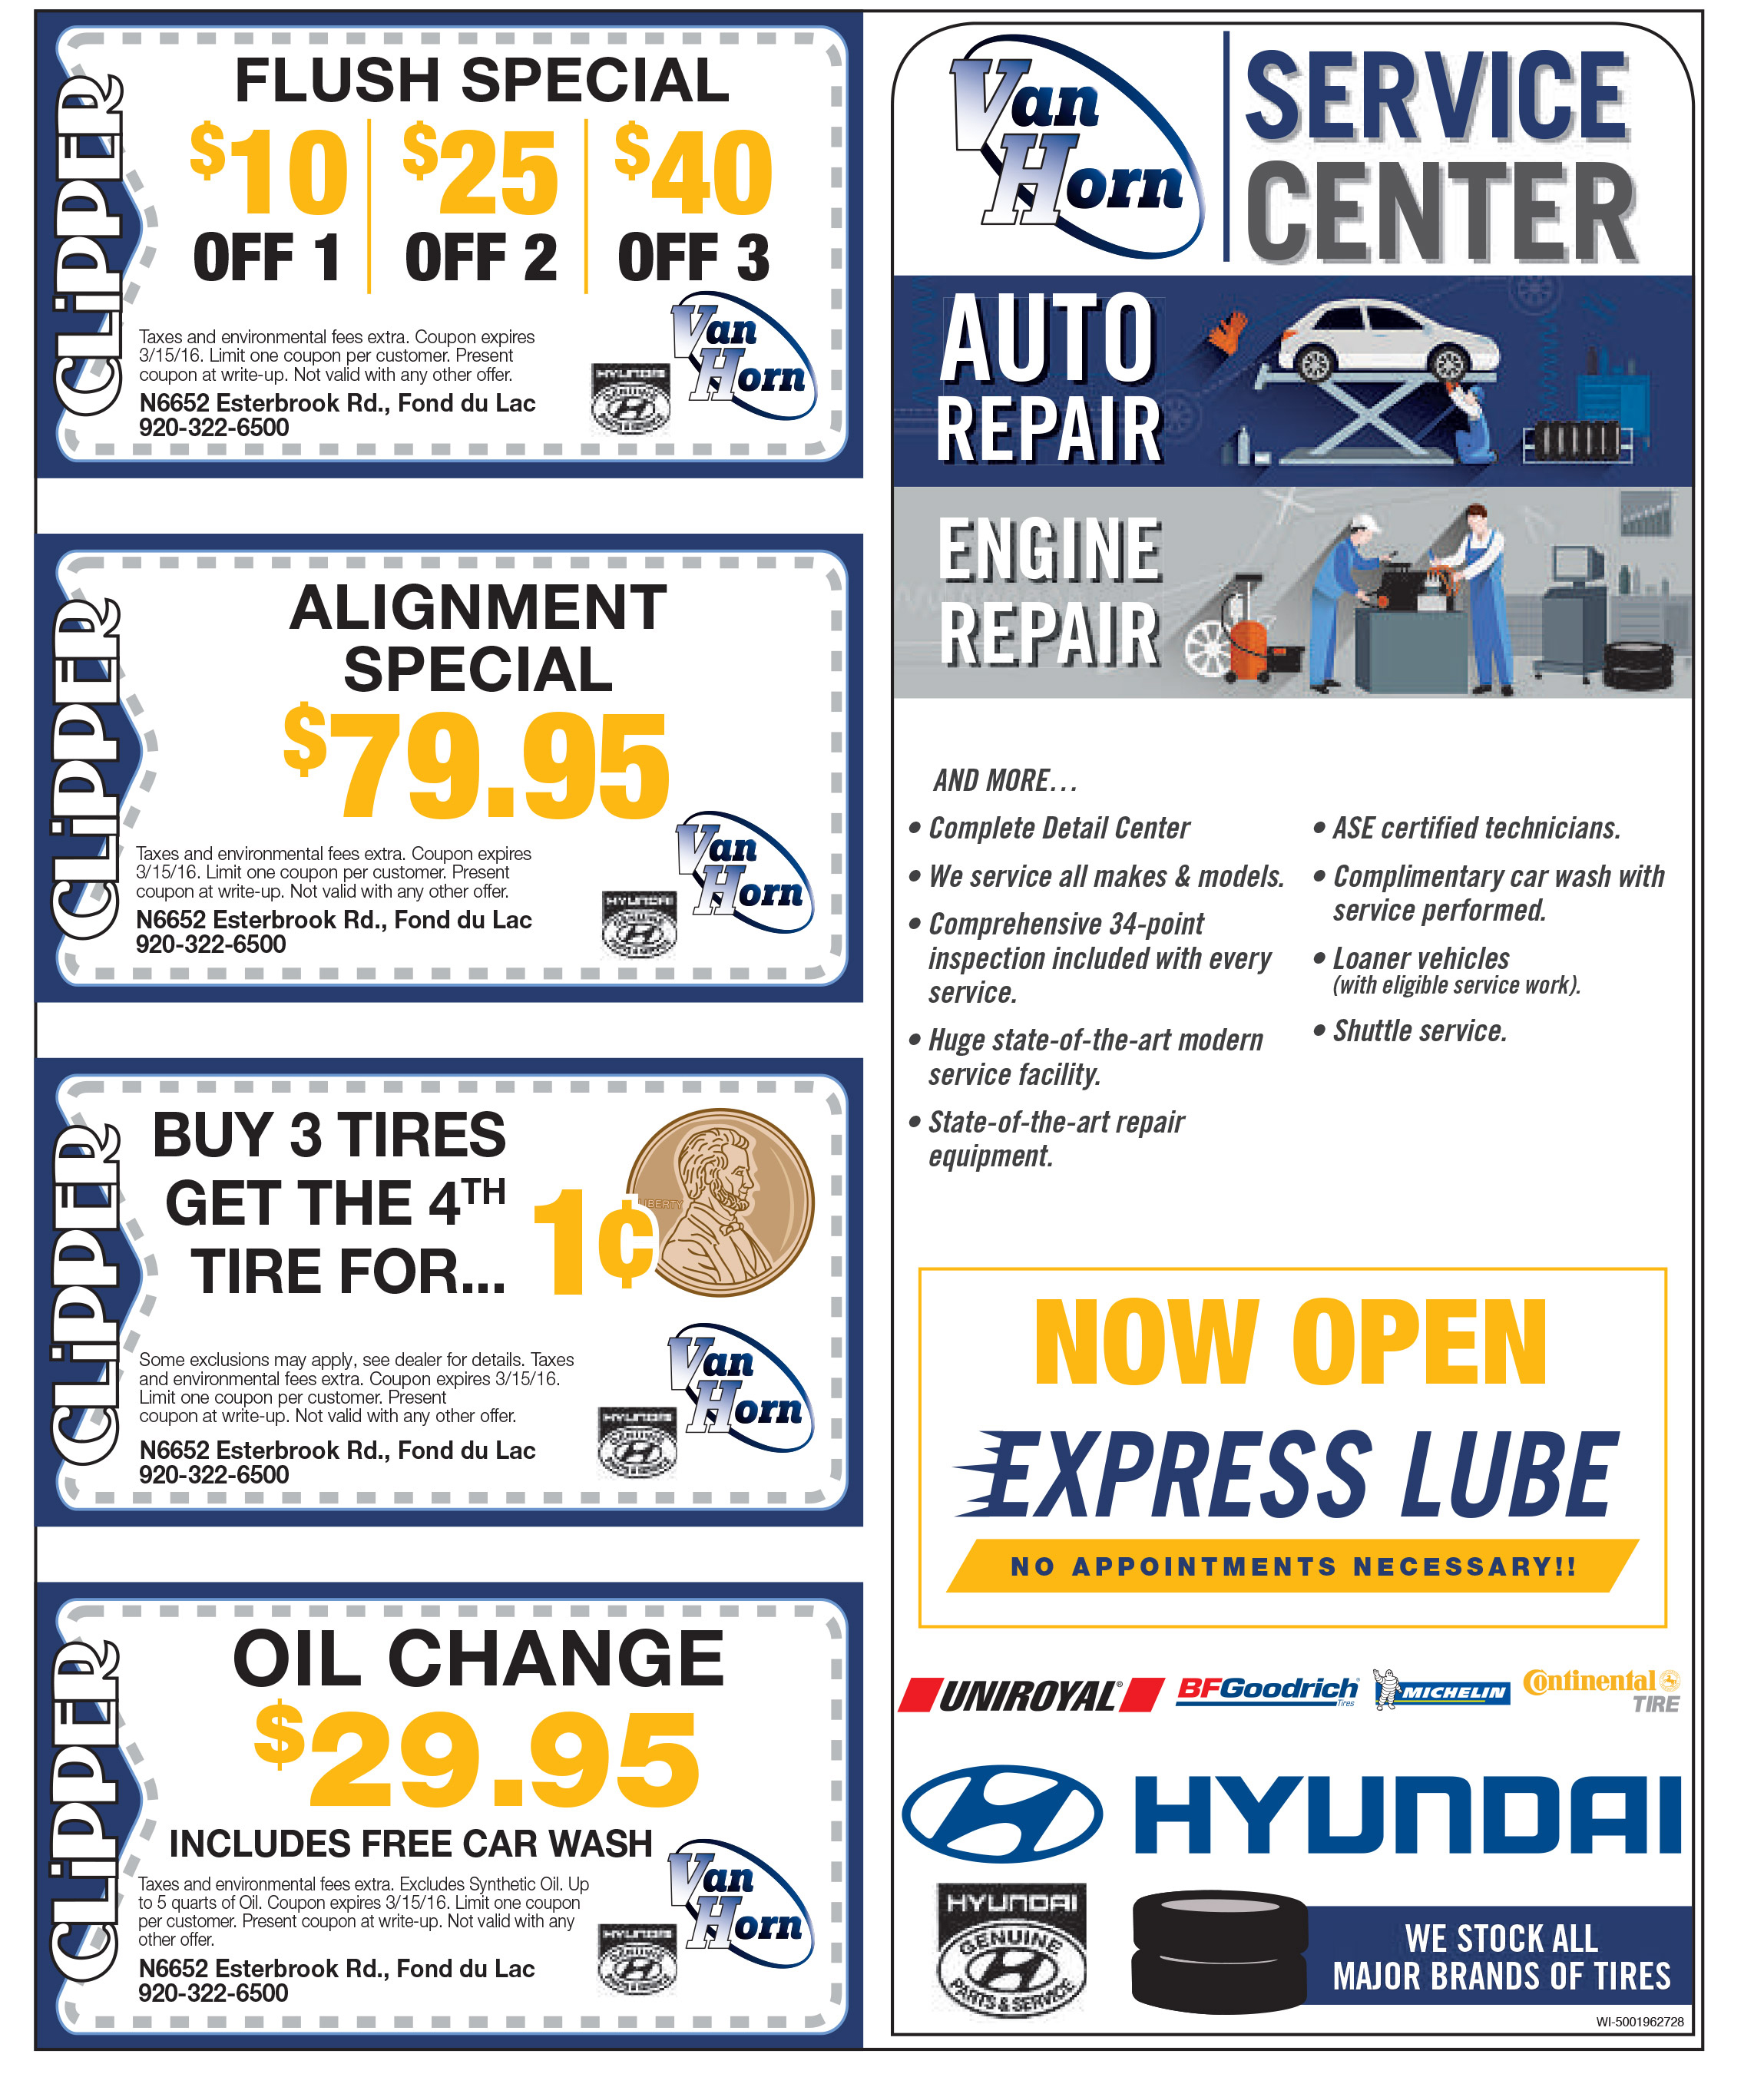 Hyundai Maintenance Schedule Service Amp Parts Specials Van Horn Hyundai Of Fon Du Lac